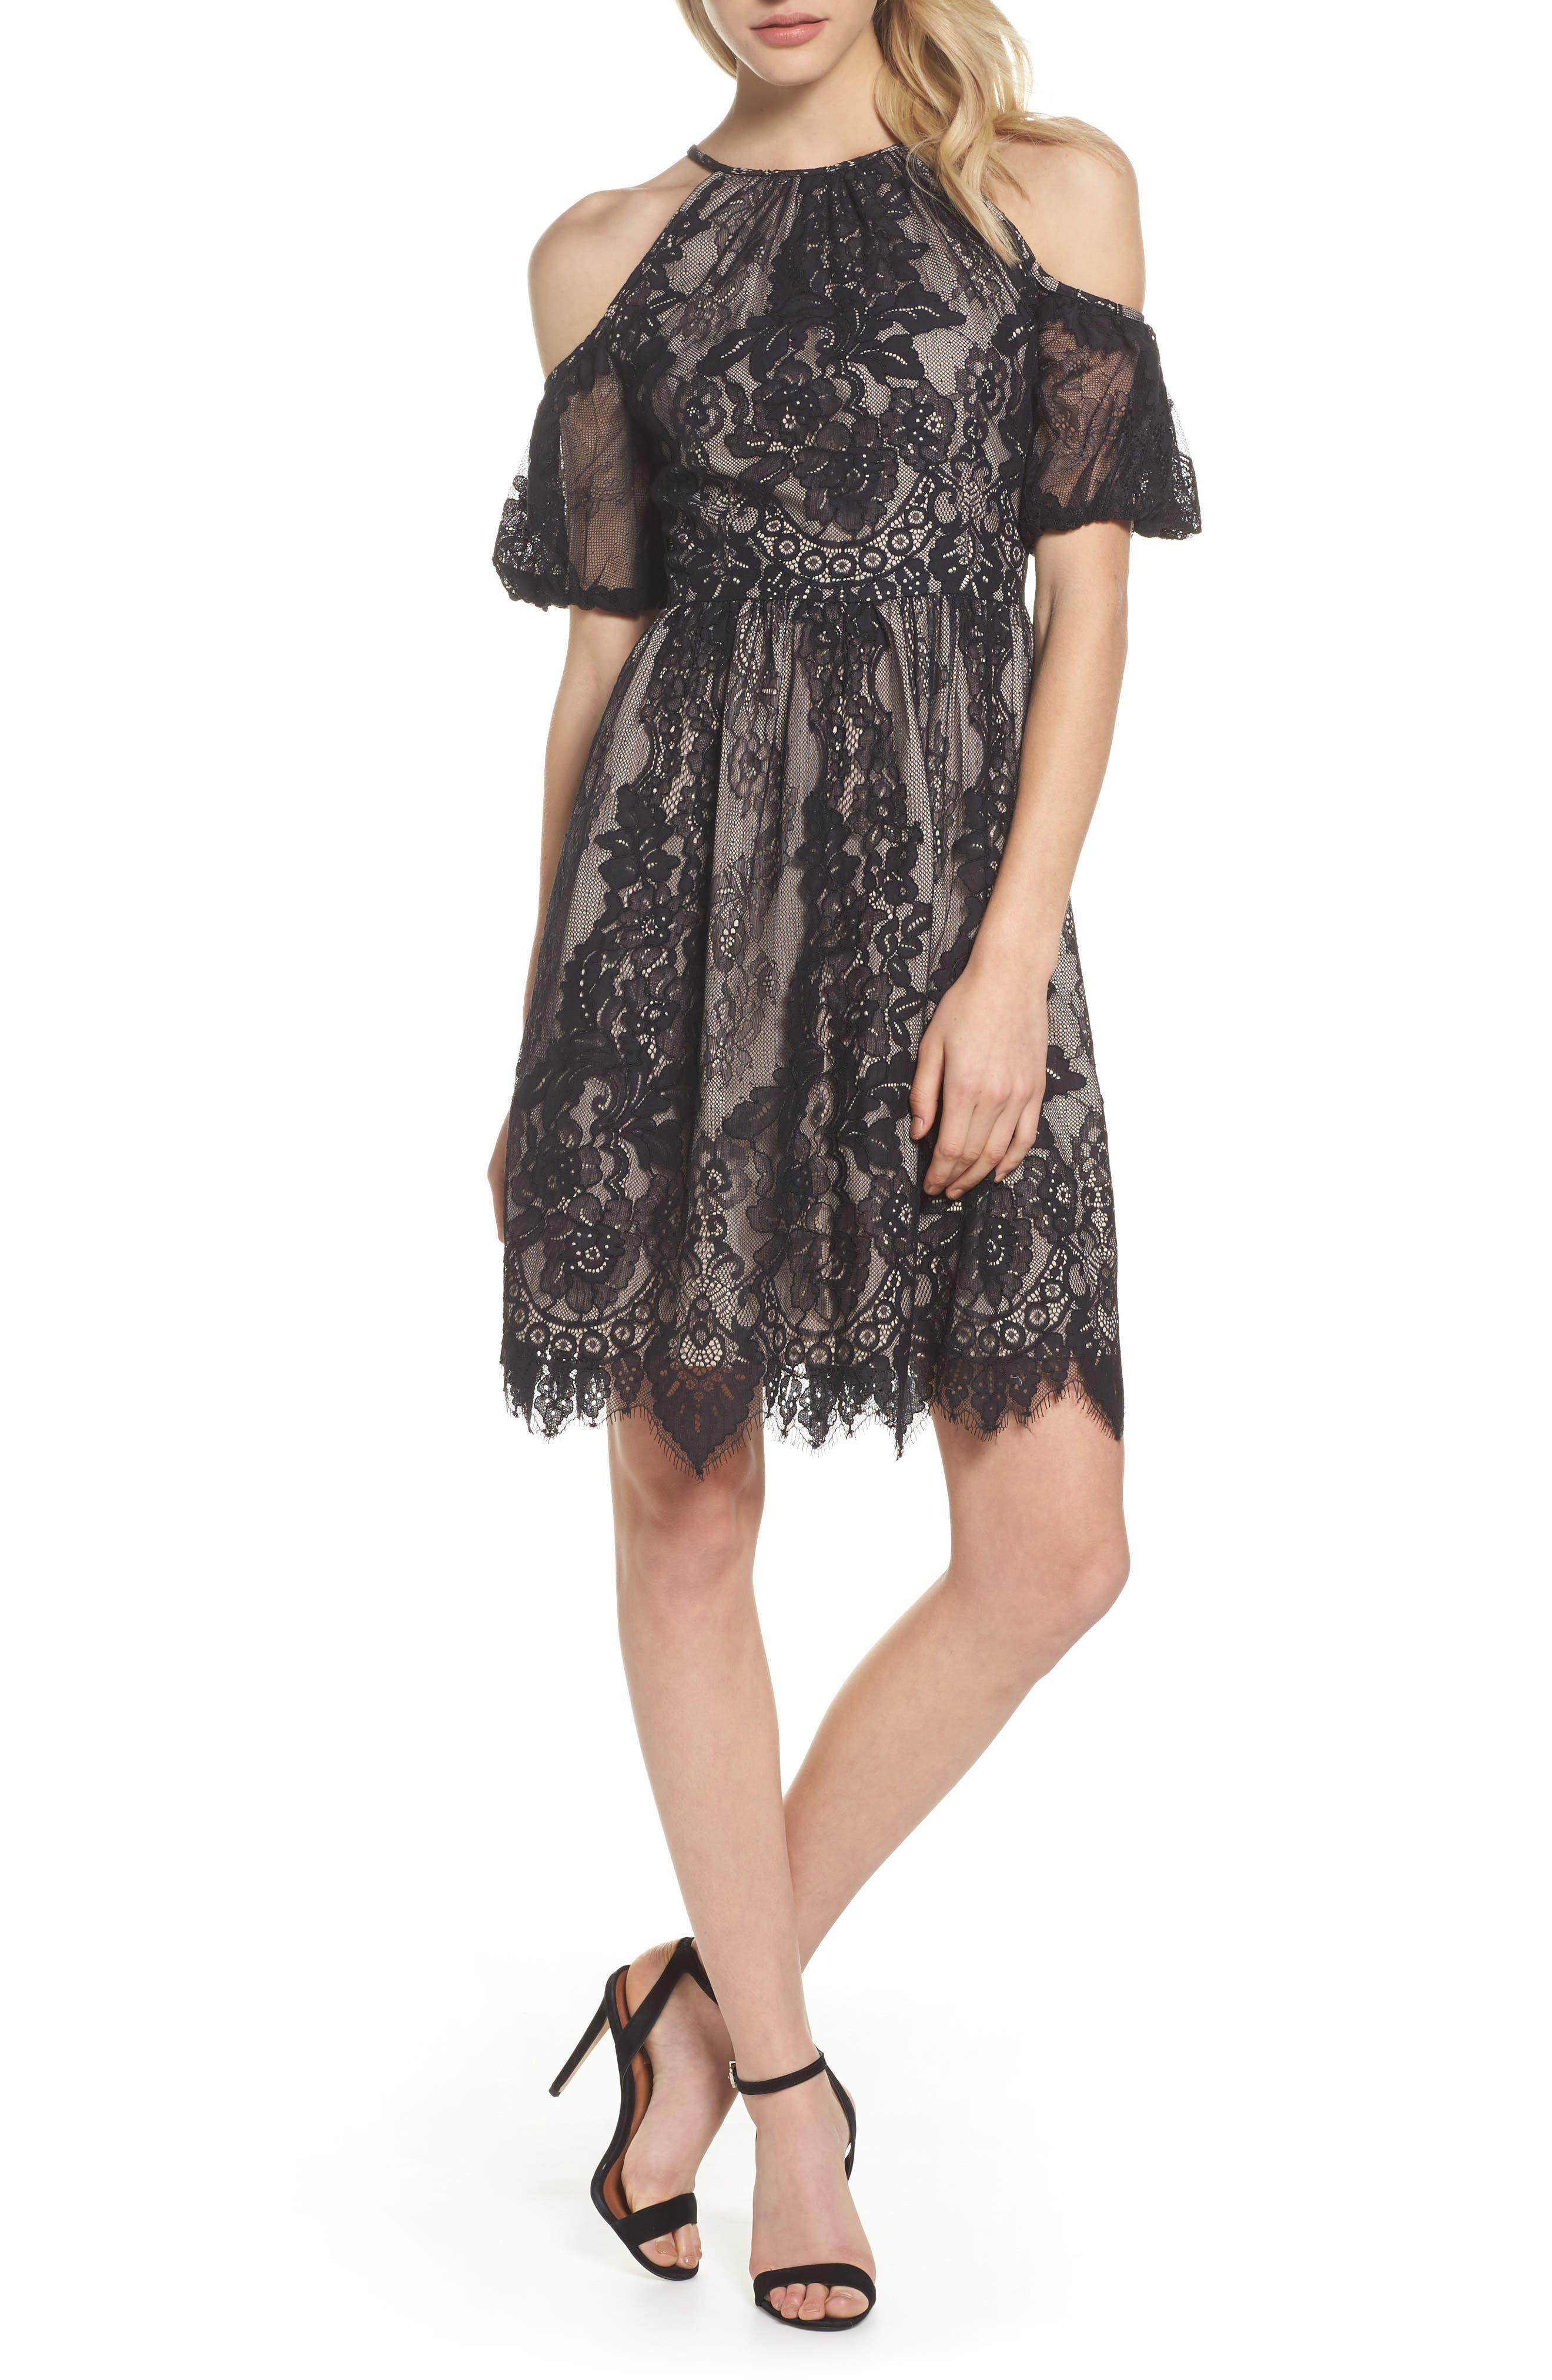 Alternate Image 1 Selected - Maggy London Cold Shoulder Lace Dress